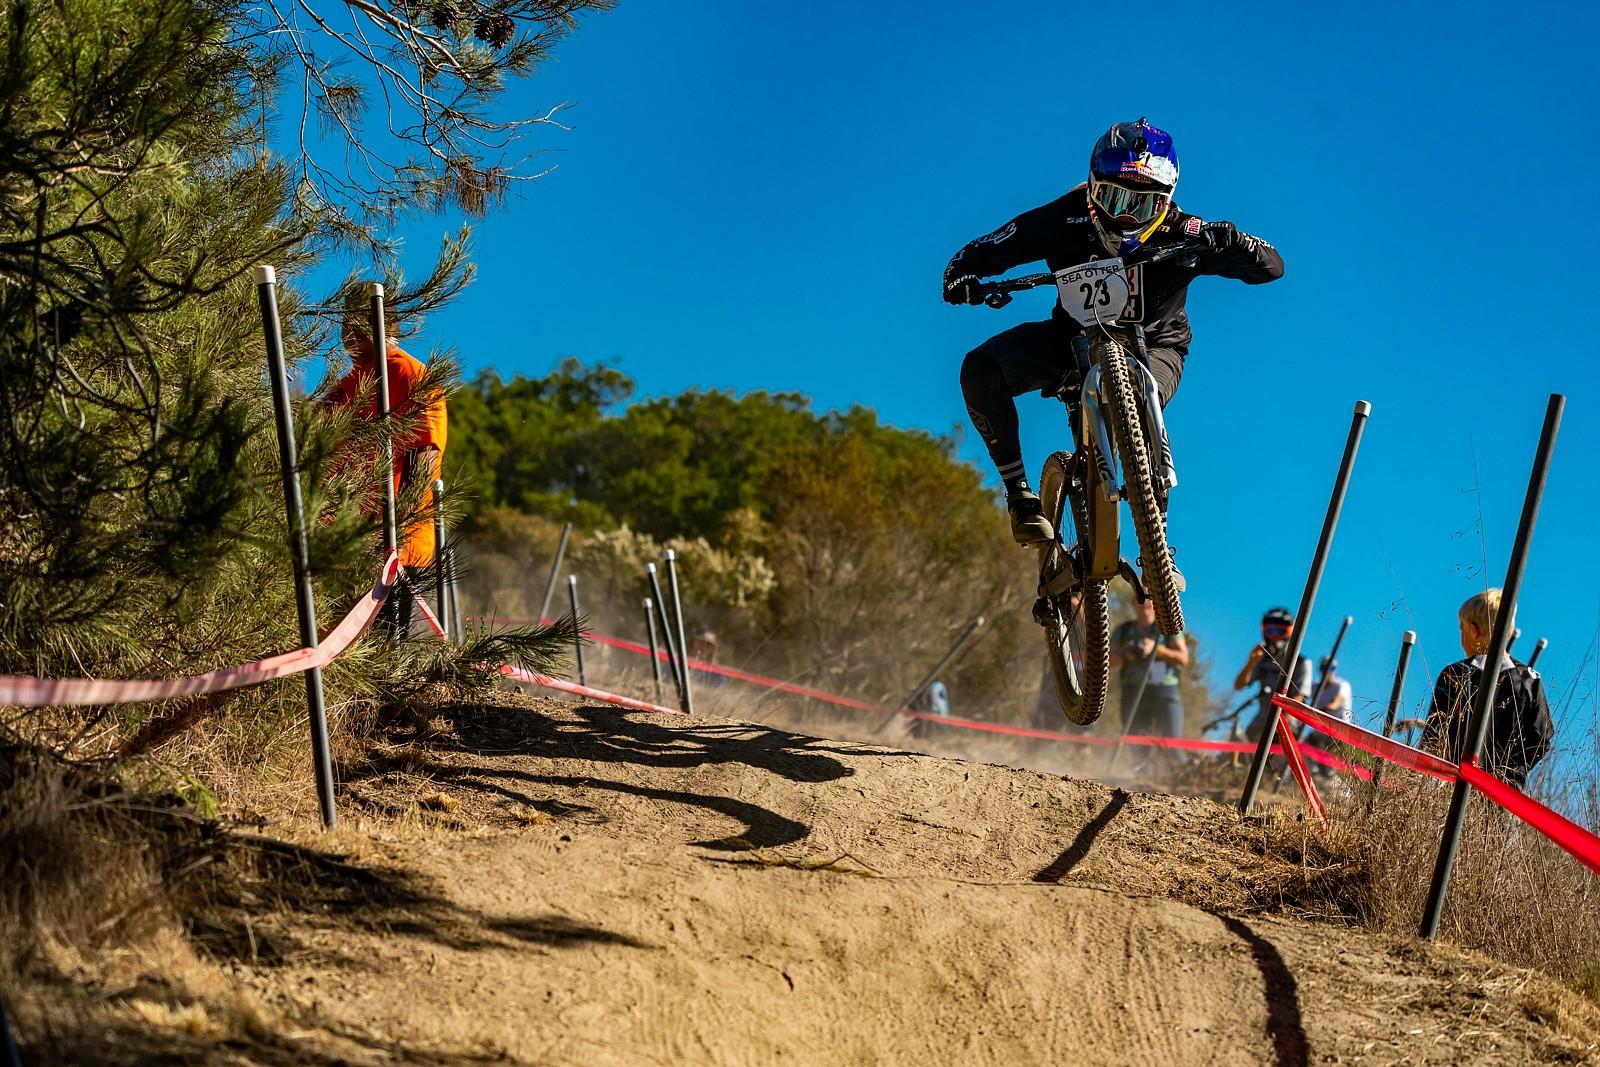 Vali Holl - Zuestman - Mountain Biking Pictures - Vital MTB